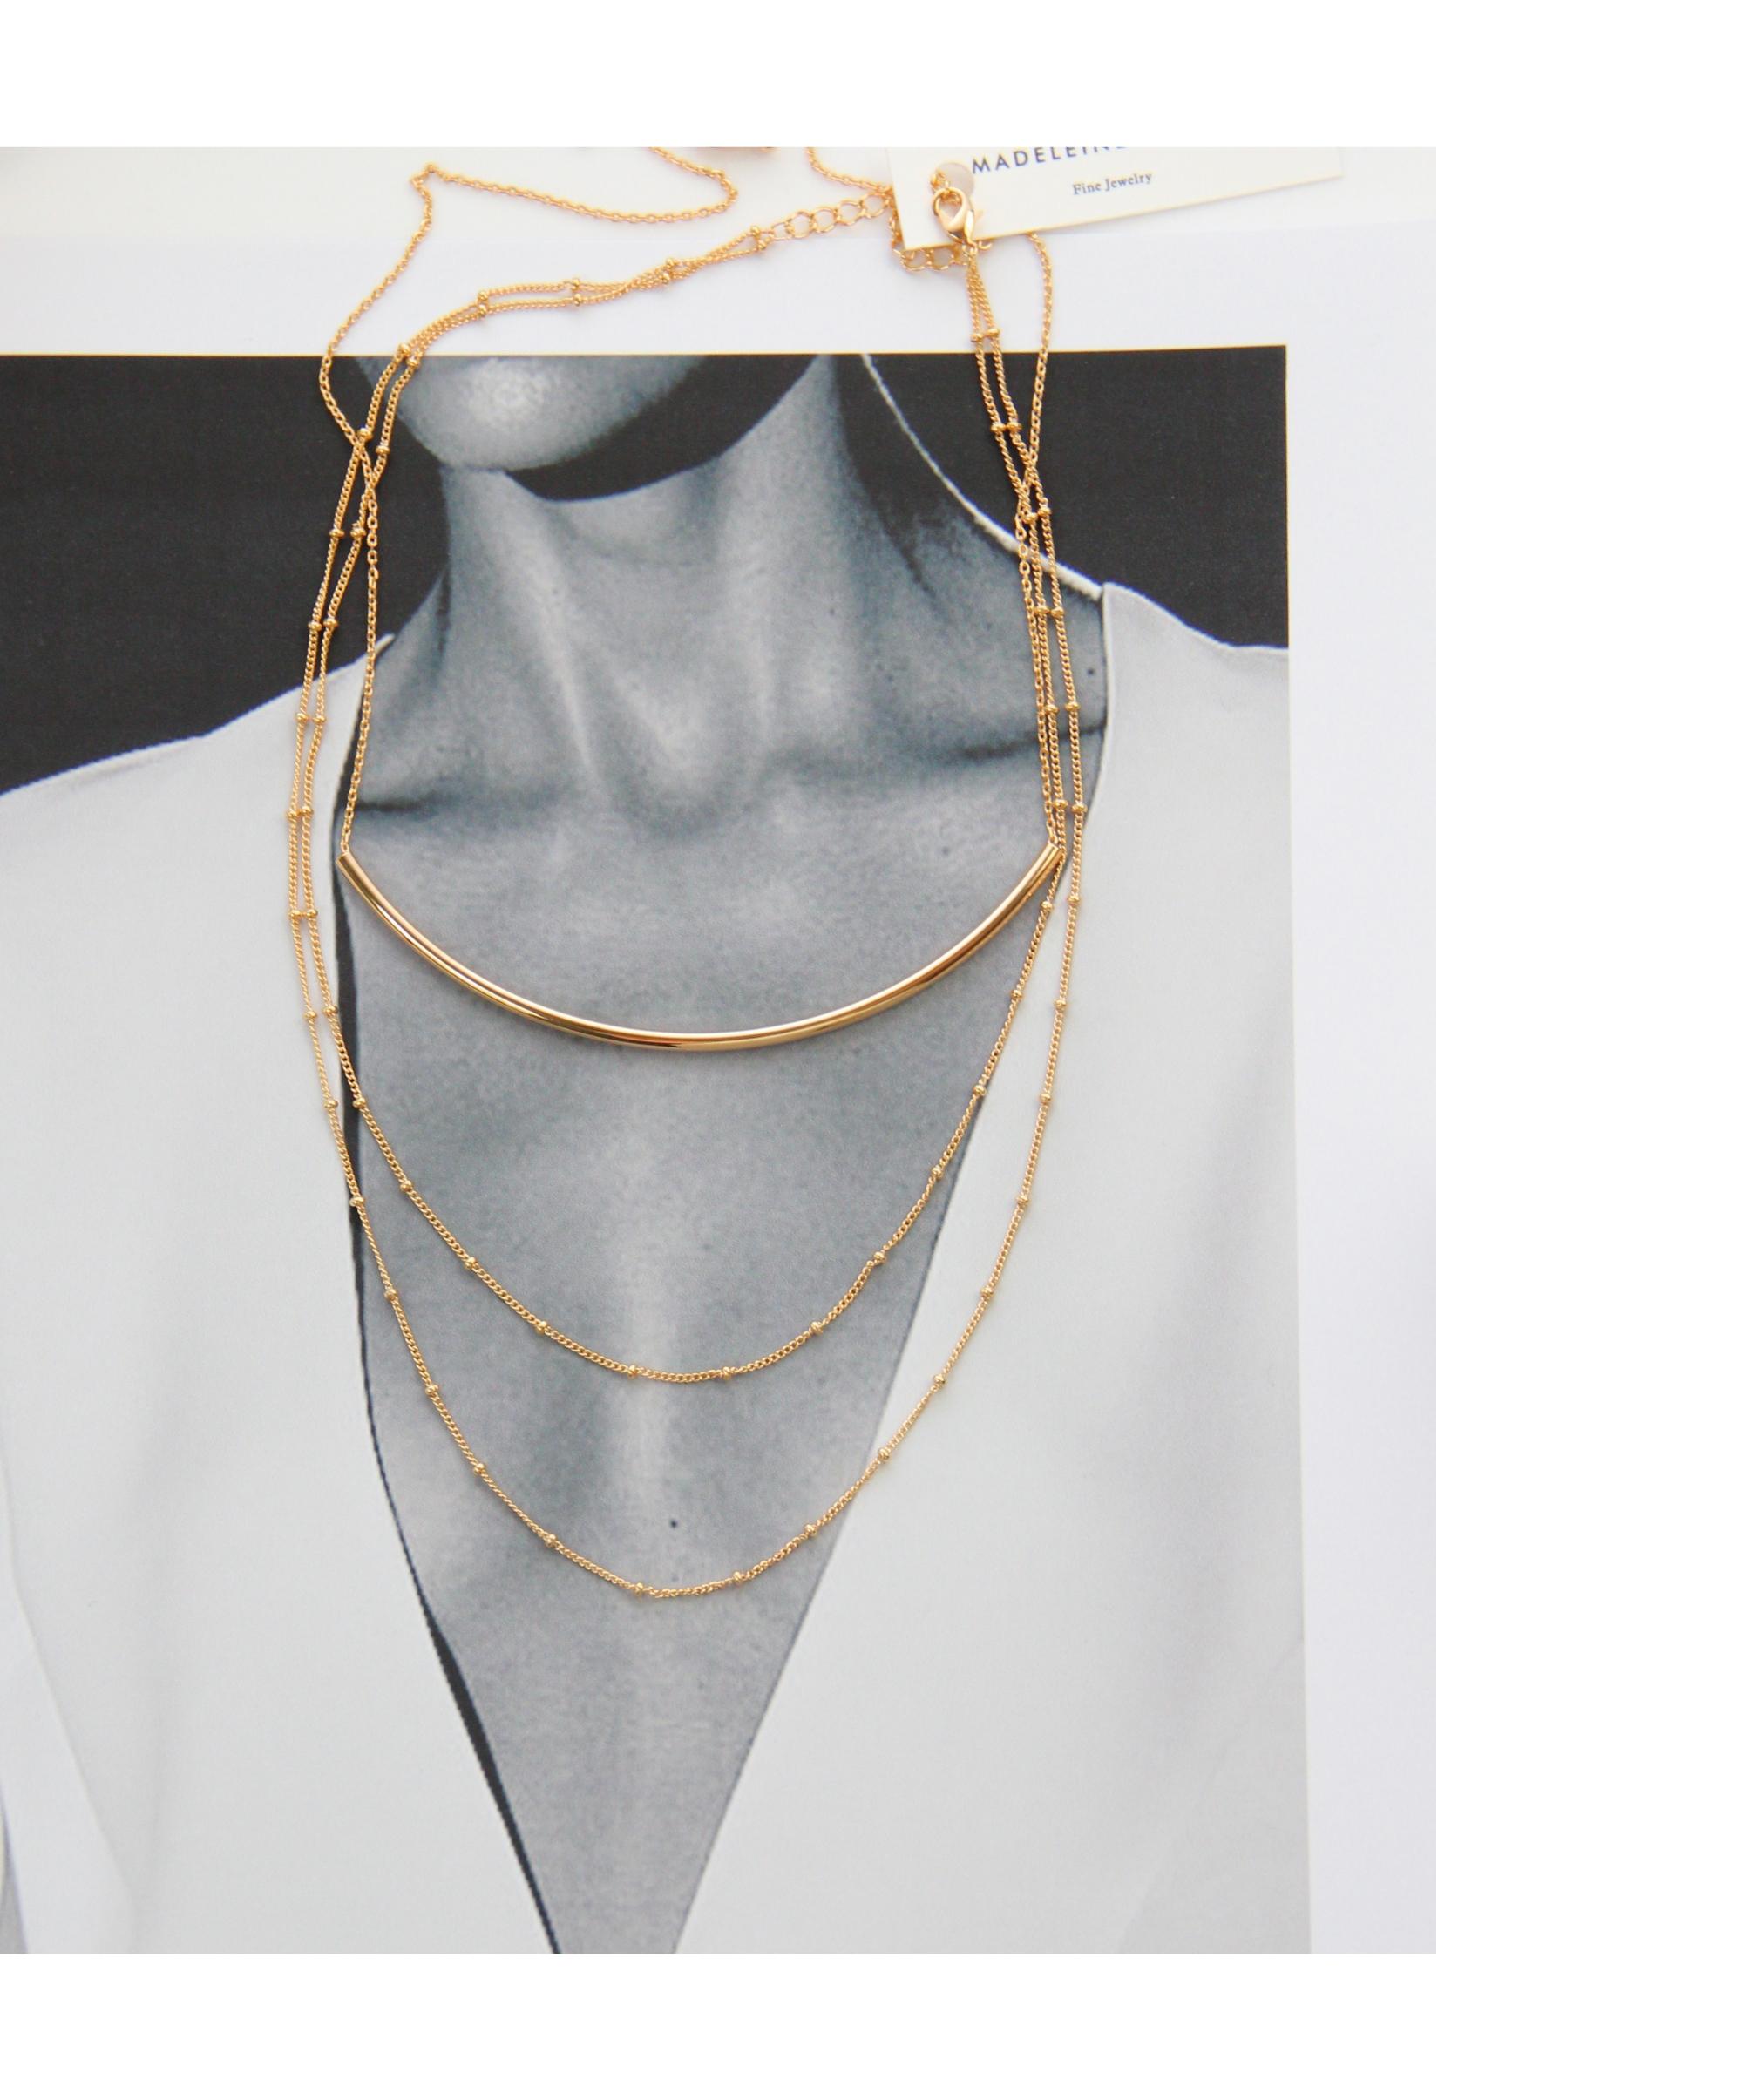 eng anliegene Halskette Gold Madeleine Issing